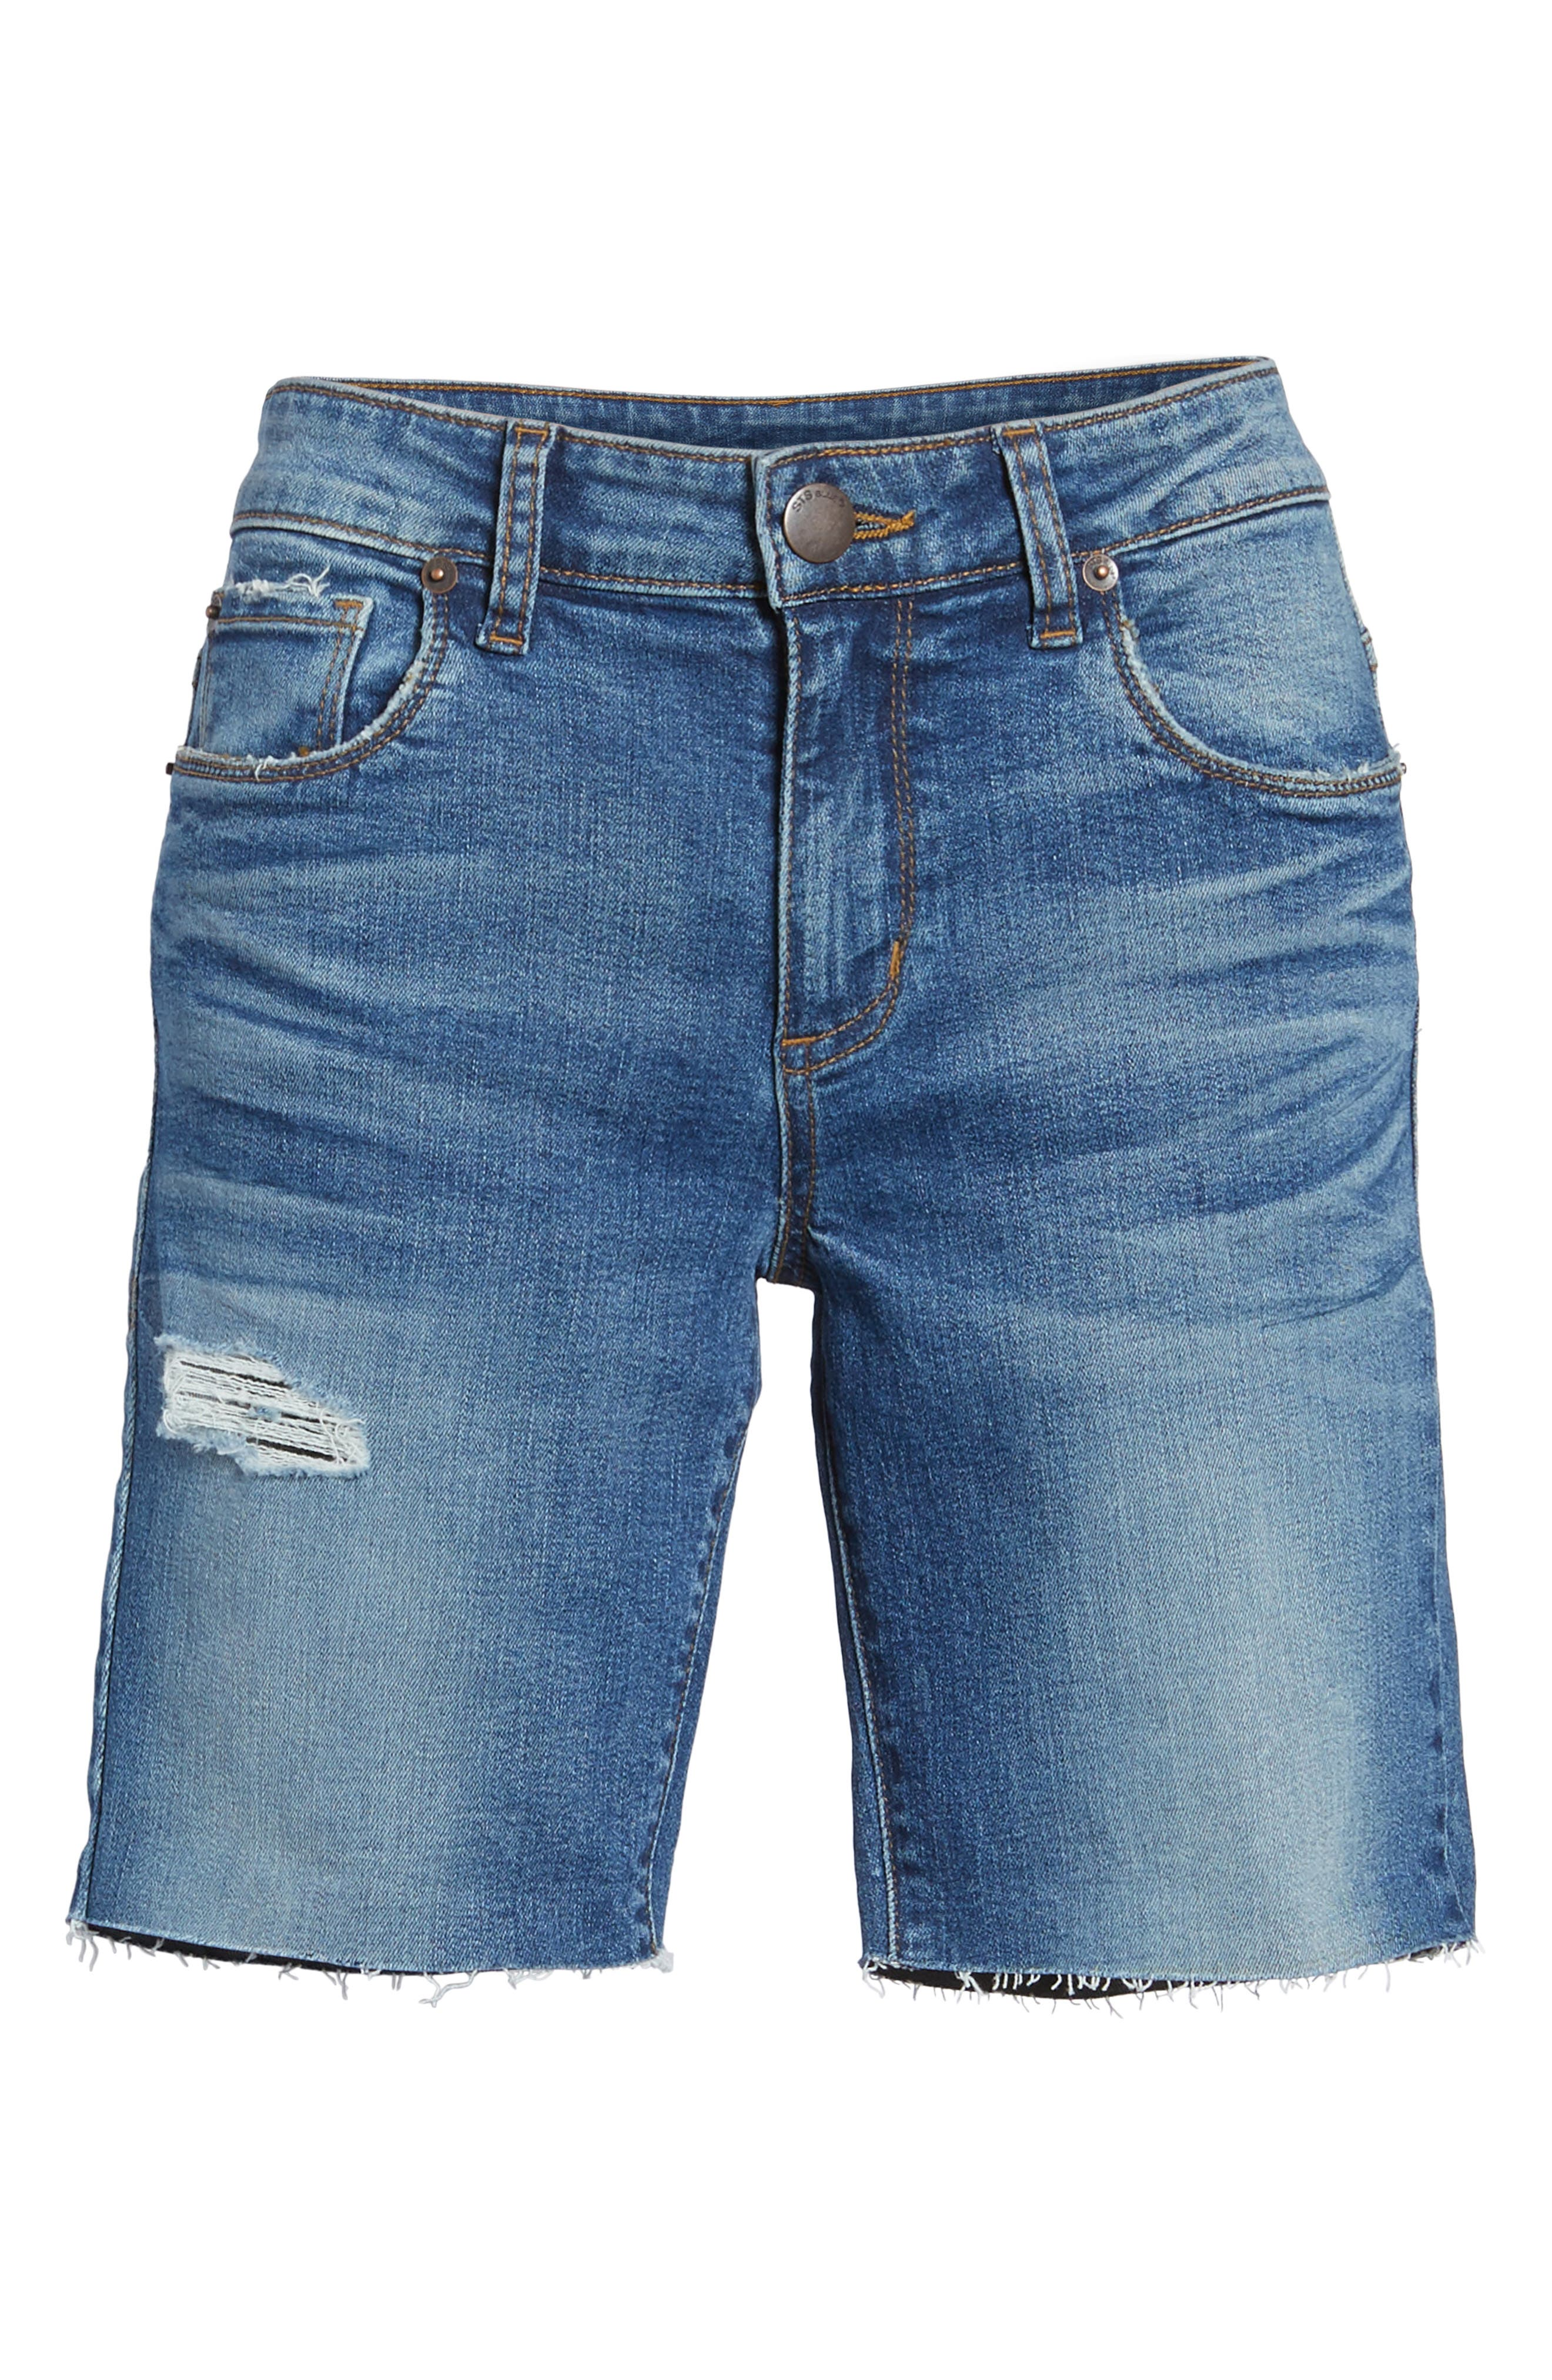 Cuffed Bermuda Denim Shorts,                             Alternate thumbnail 6, color,                             Lilac W/ Med Base